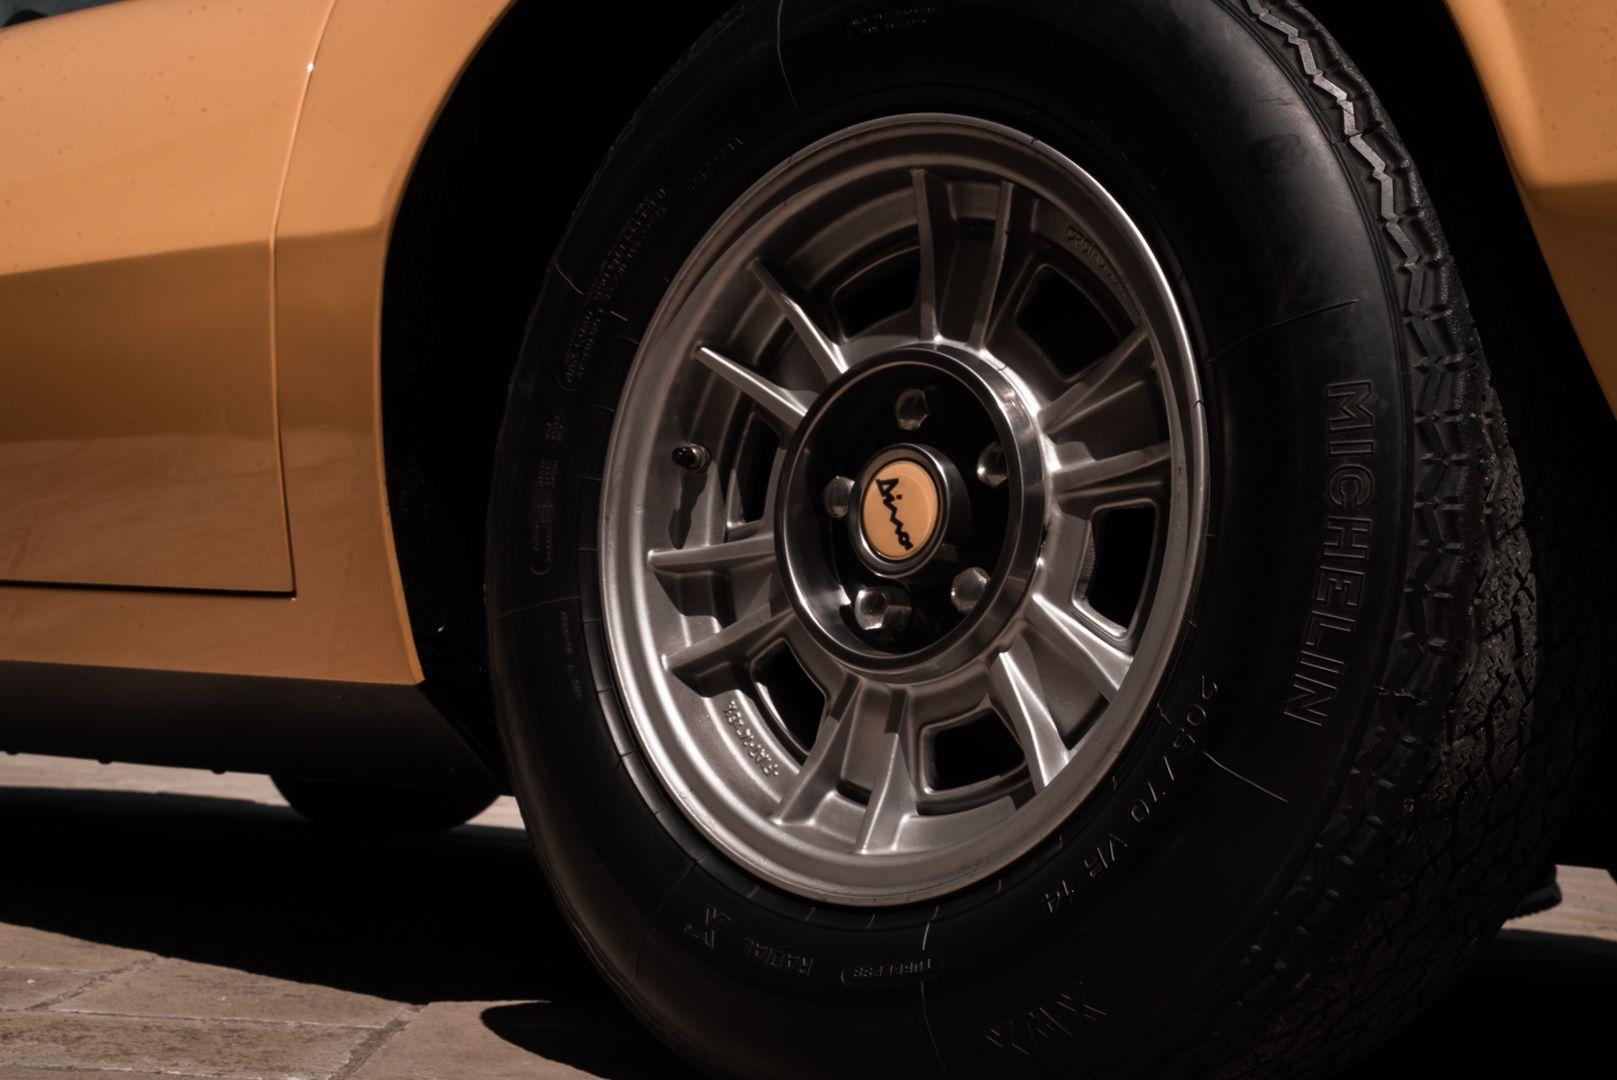 1972 Ferrari Dino 246 GT 70550